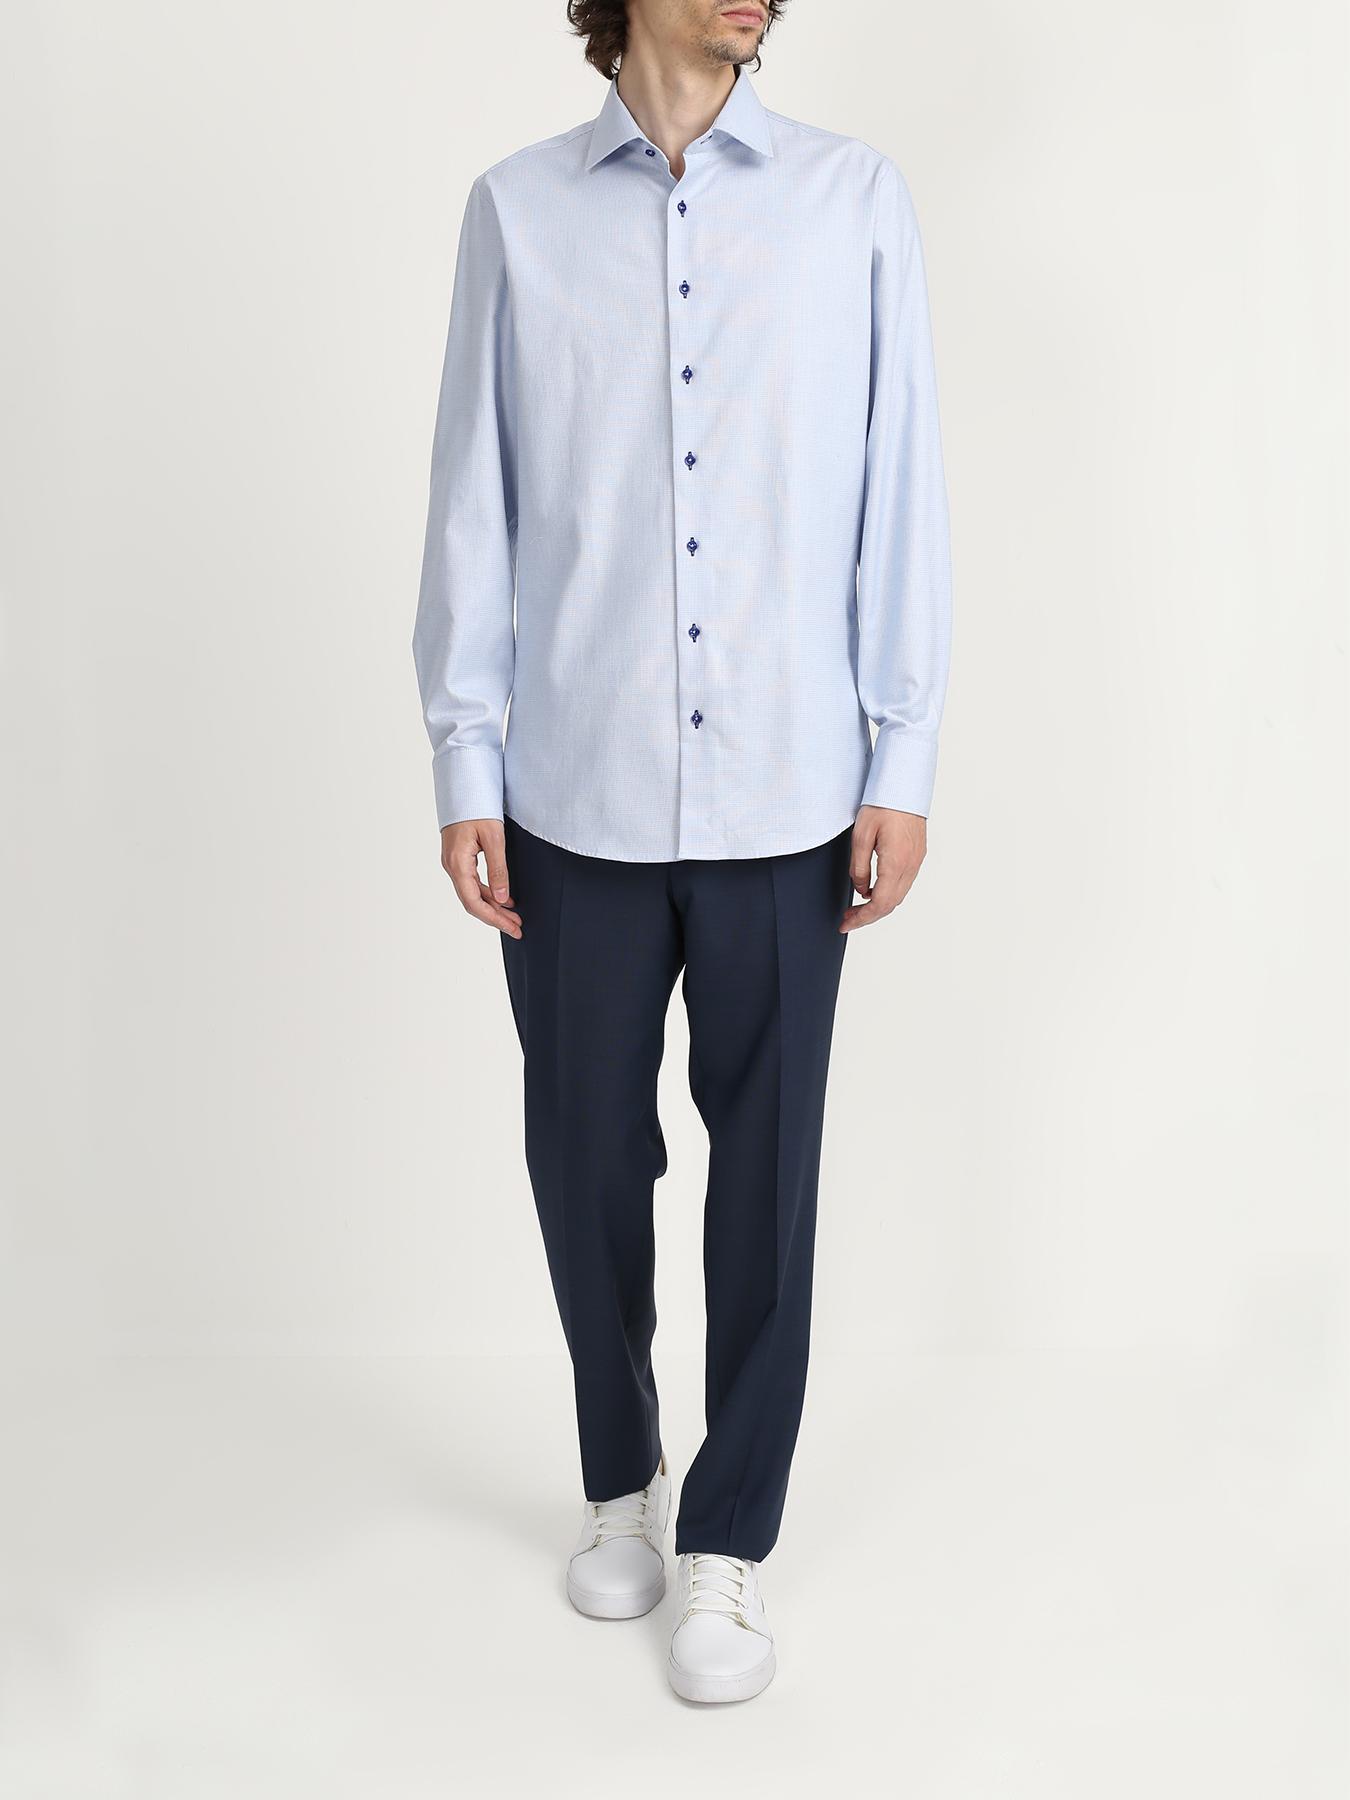 Ritter Хлопковая рубашка от Ritter